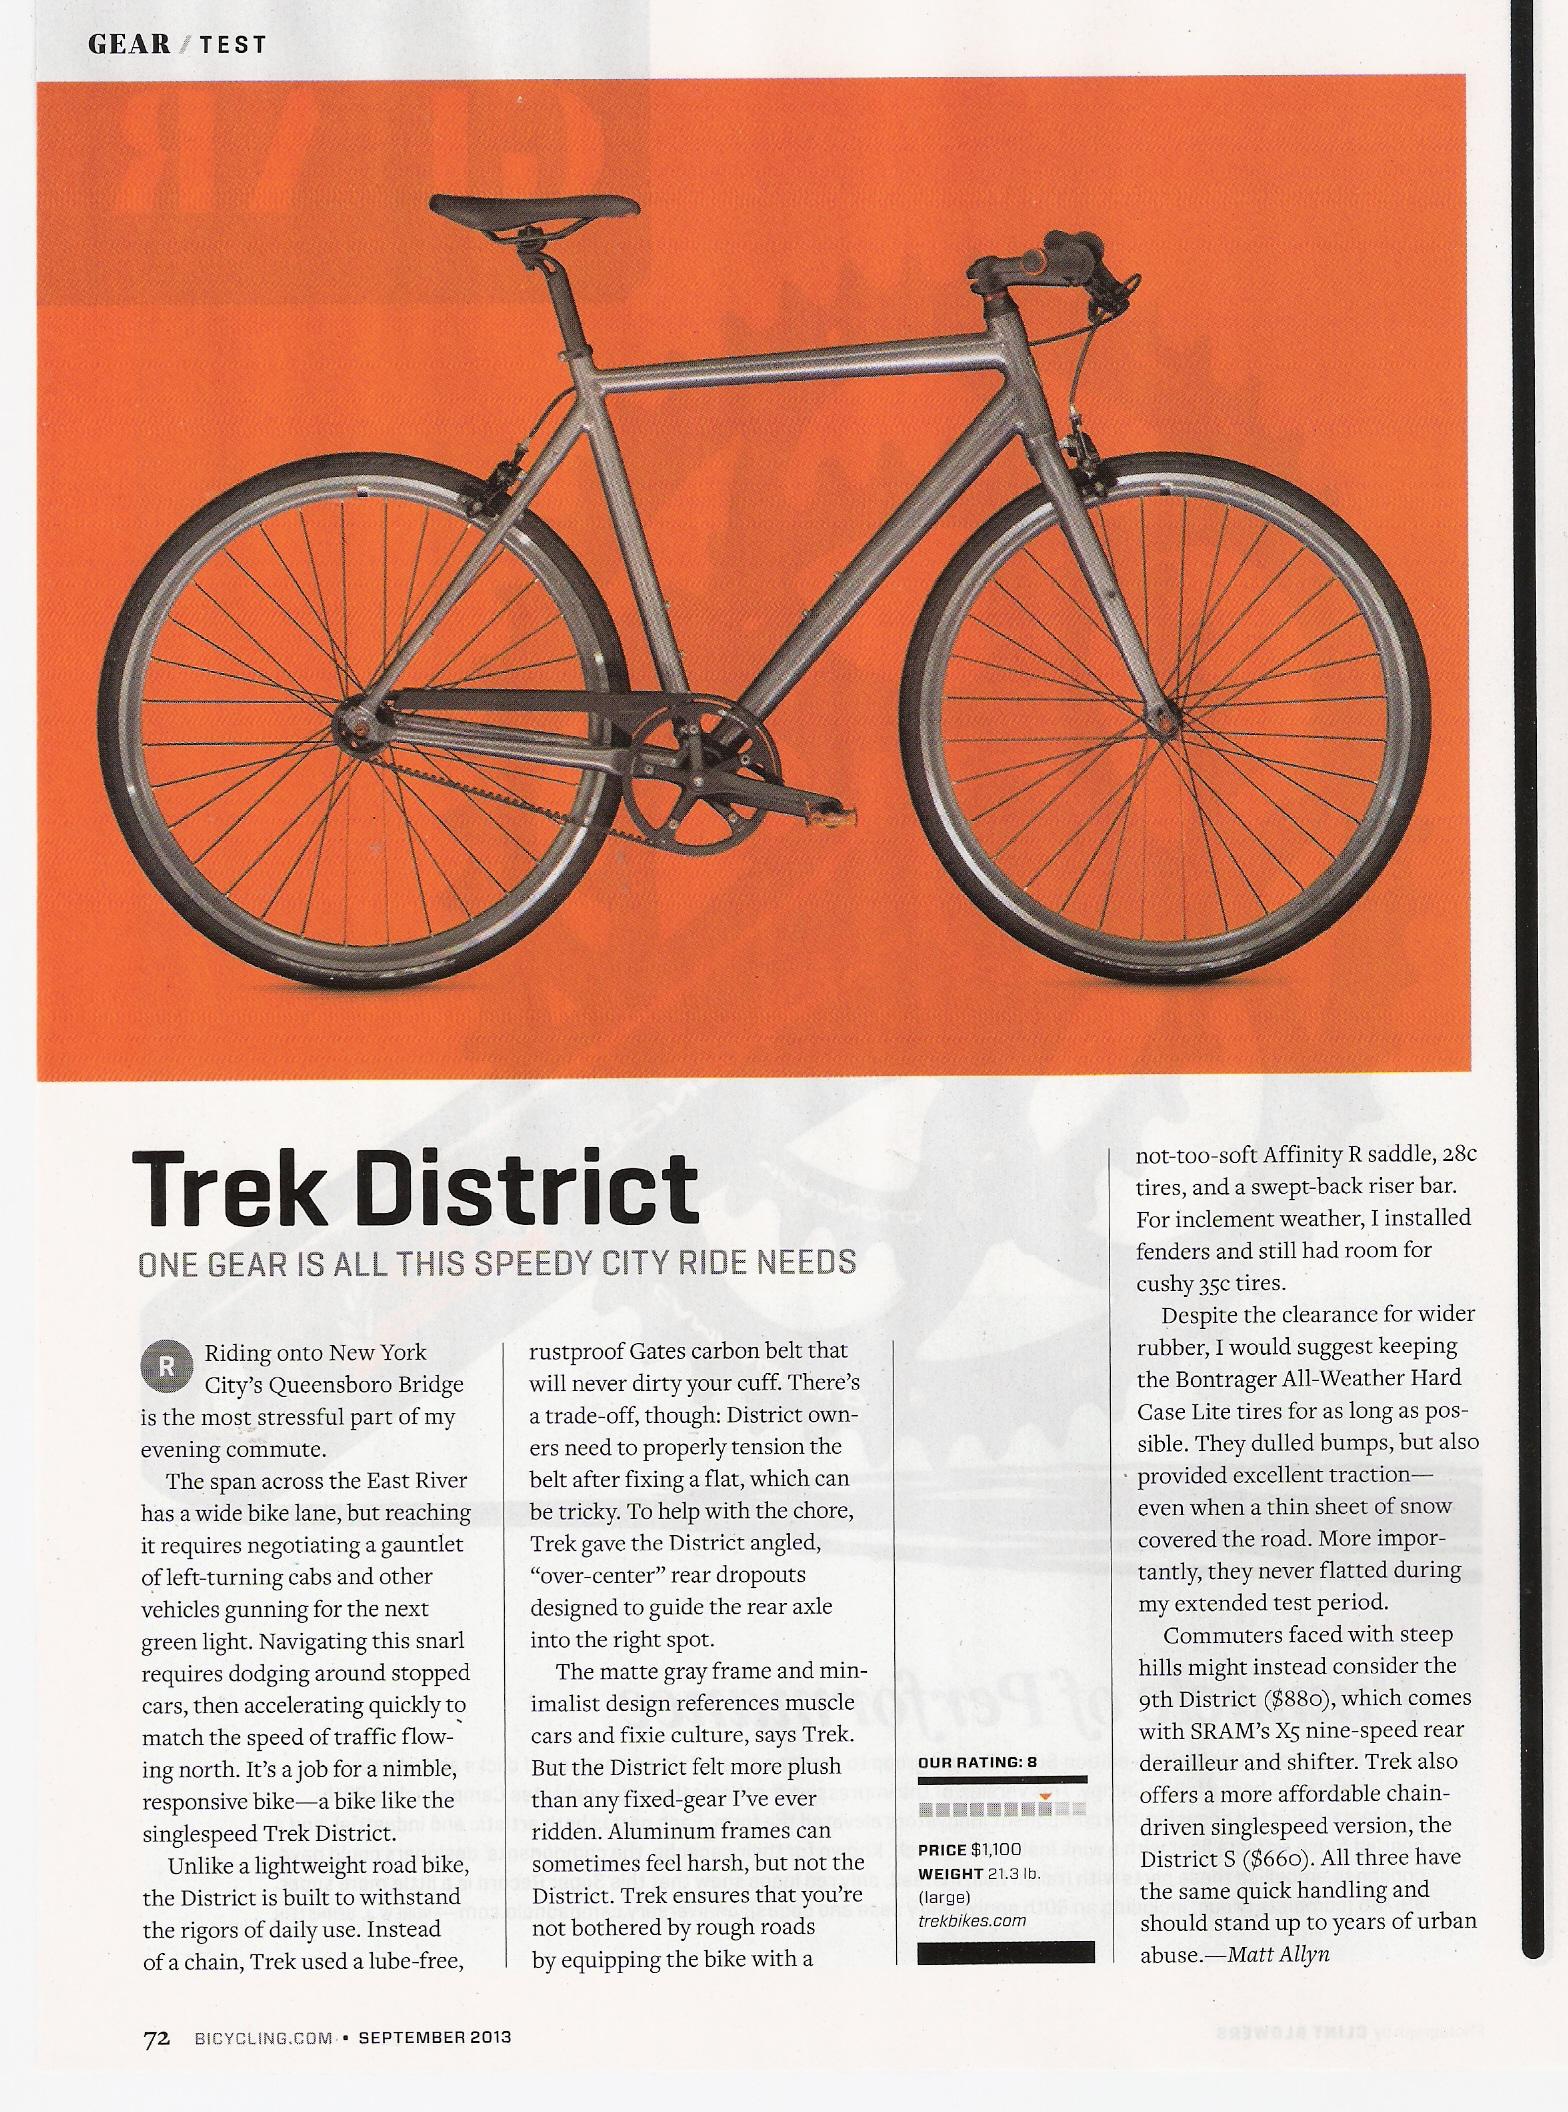 Bicycling Sept 2013 Trek District